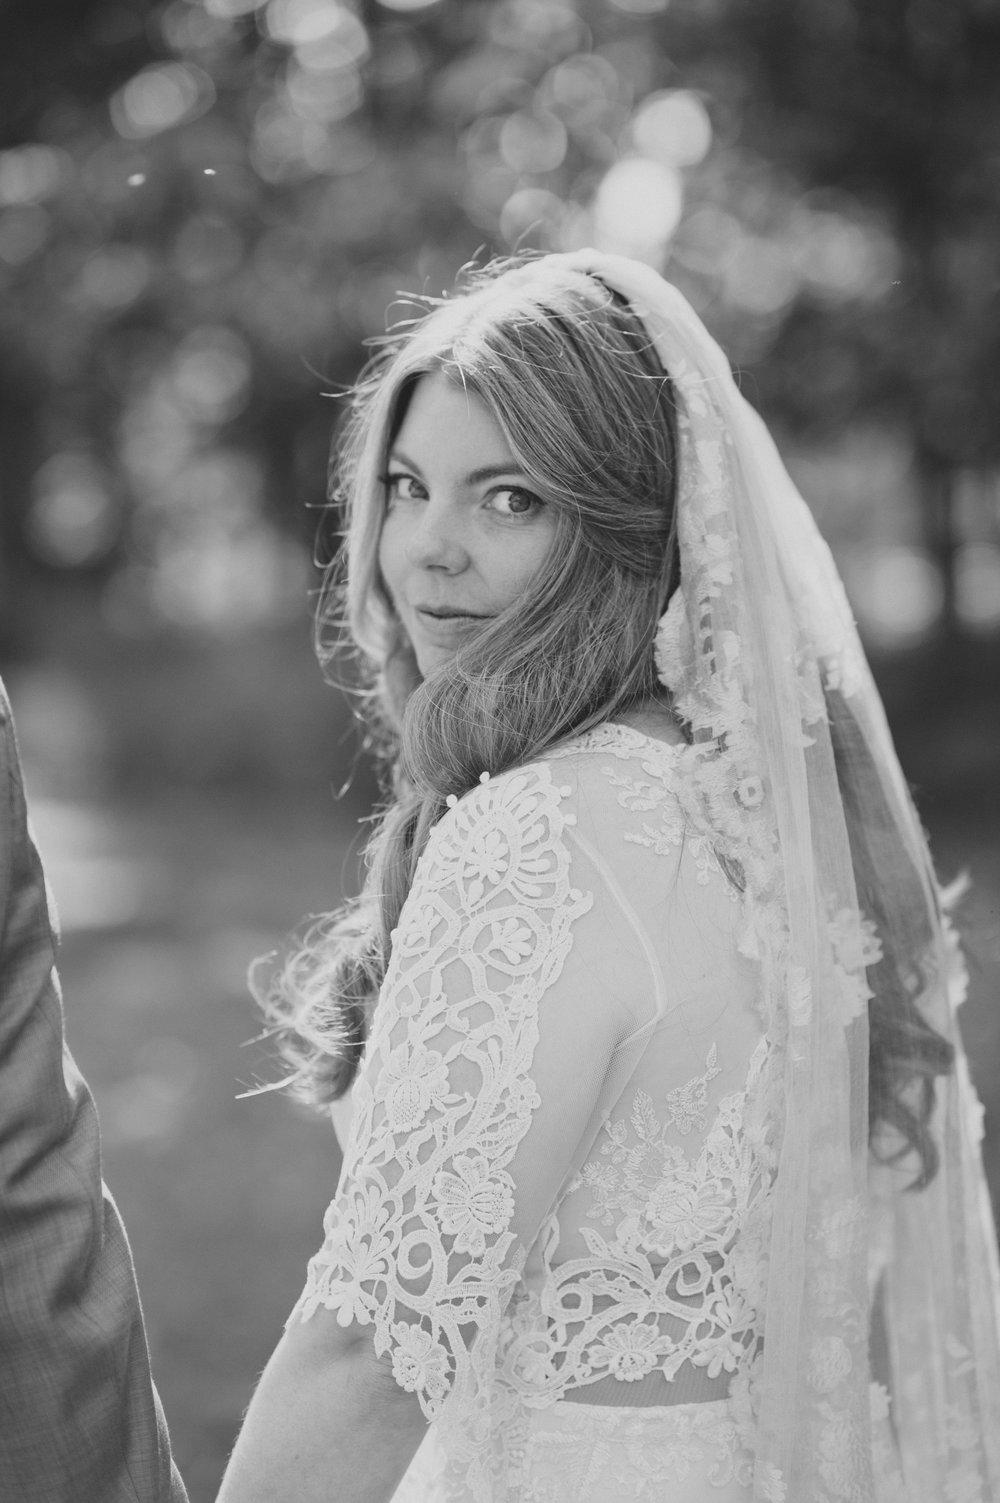 Caitlin | September 2015 |Woolverton Inn | Stockton, New Jersey |  Christina Lilly Photography